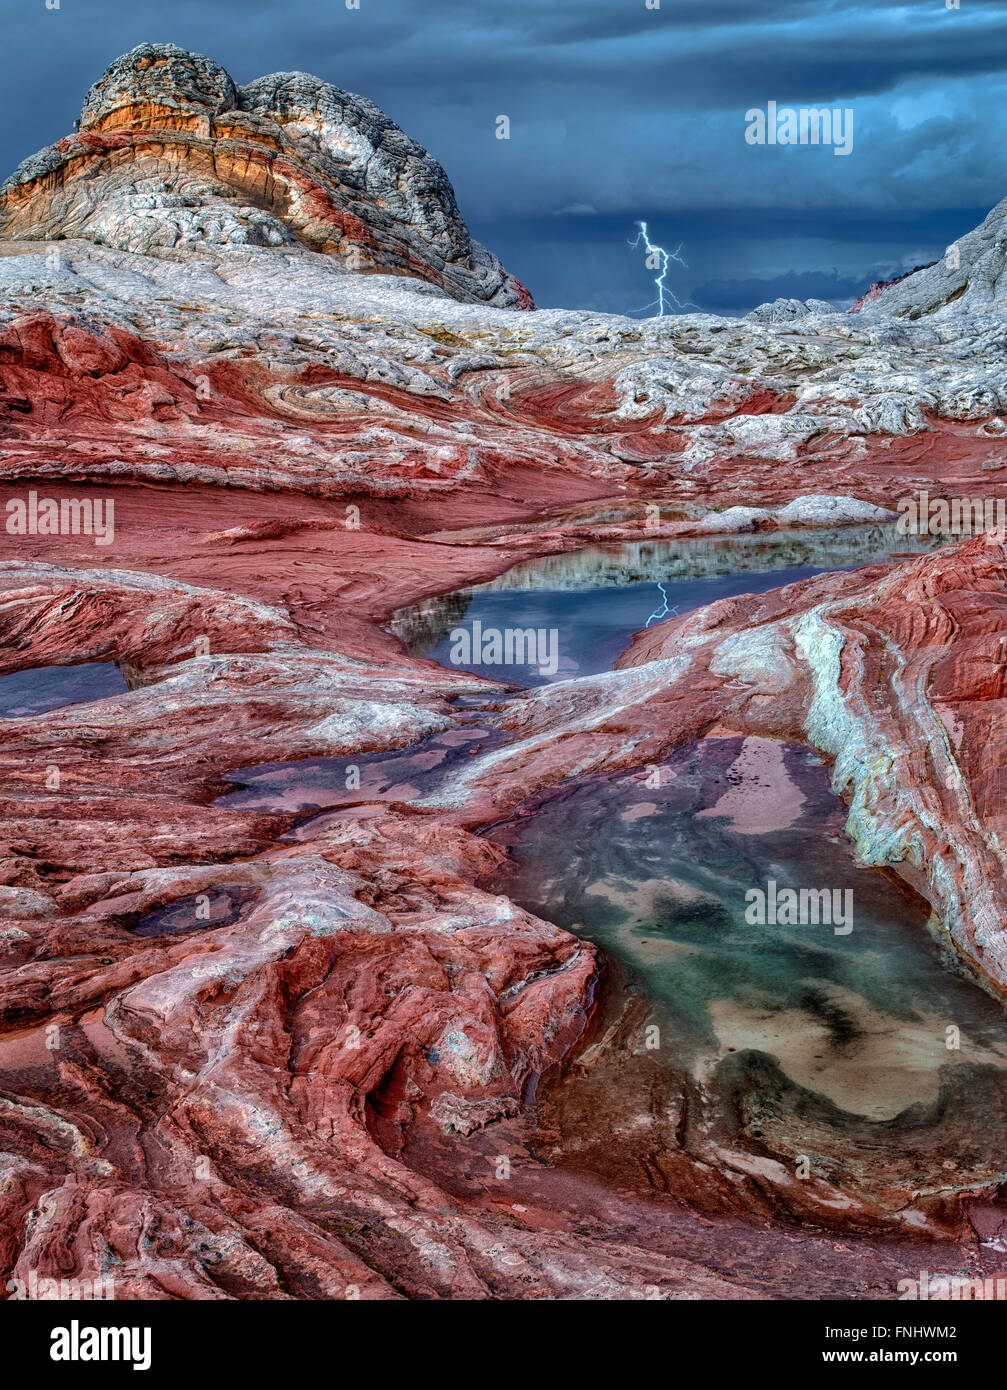 Bolsillo blanco con piscinas de agua de lluvia. Vermilion Cliffs National Monument, Arizona Imagen De Stock